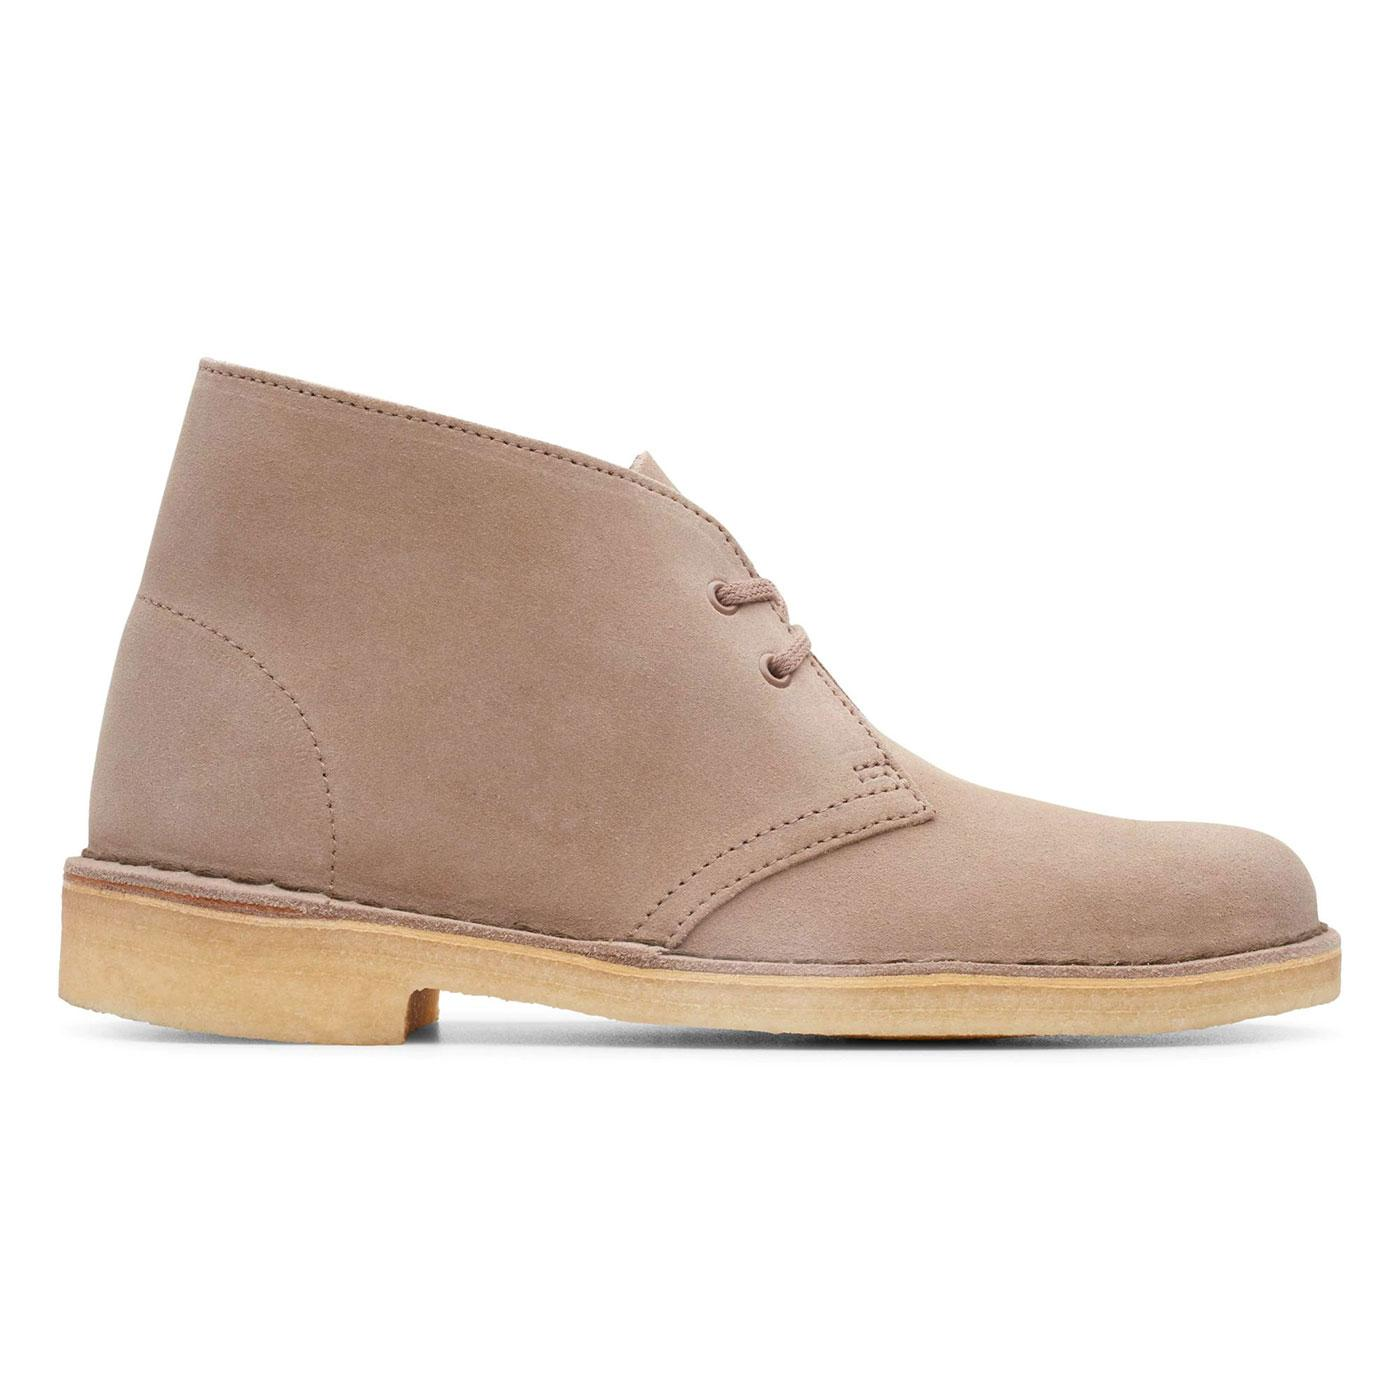 CLARKS ORIGINALS Womens Mod Suede Desert Boots (M)